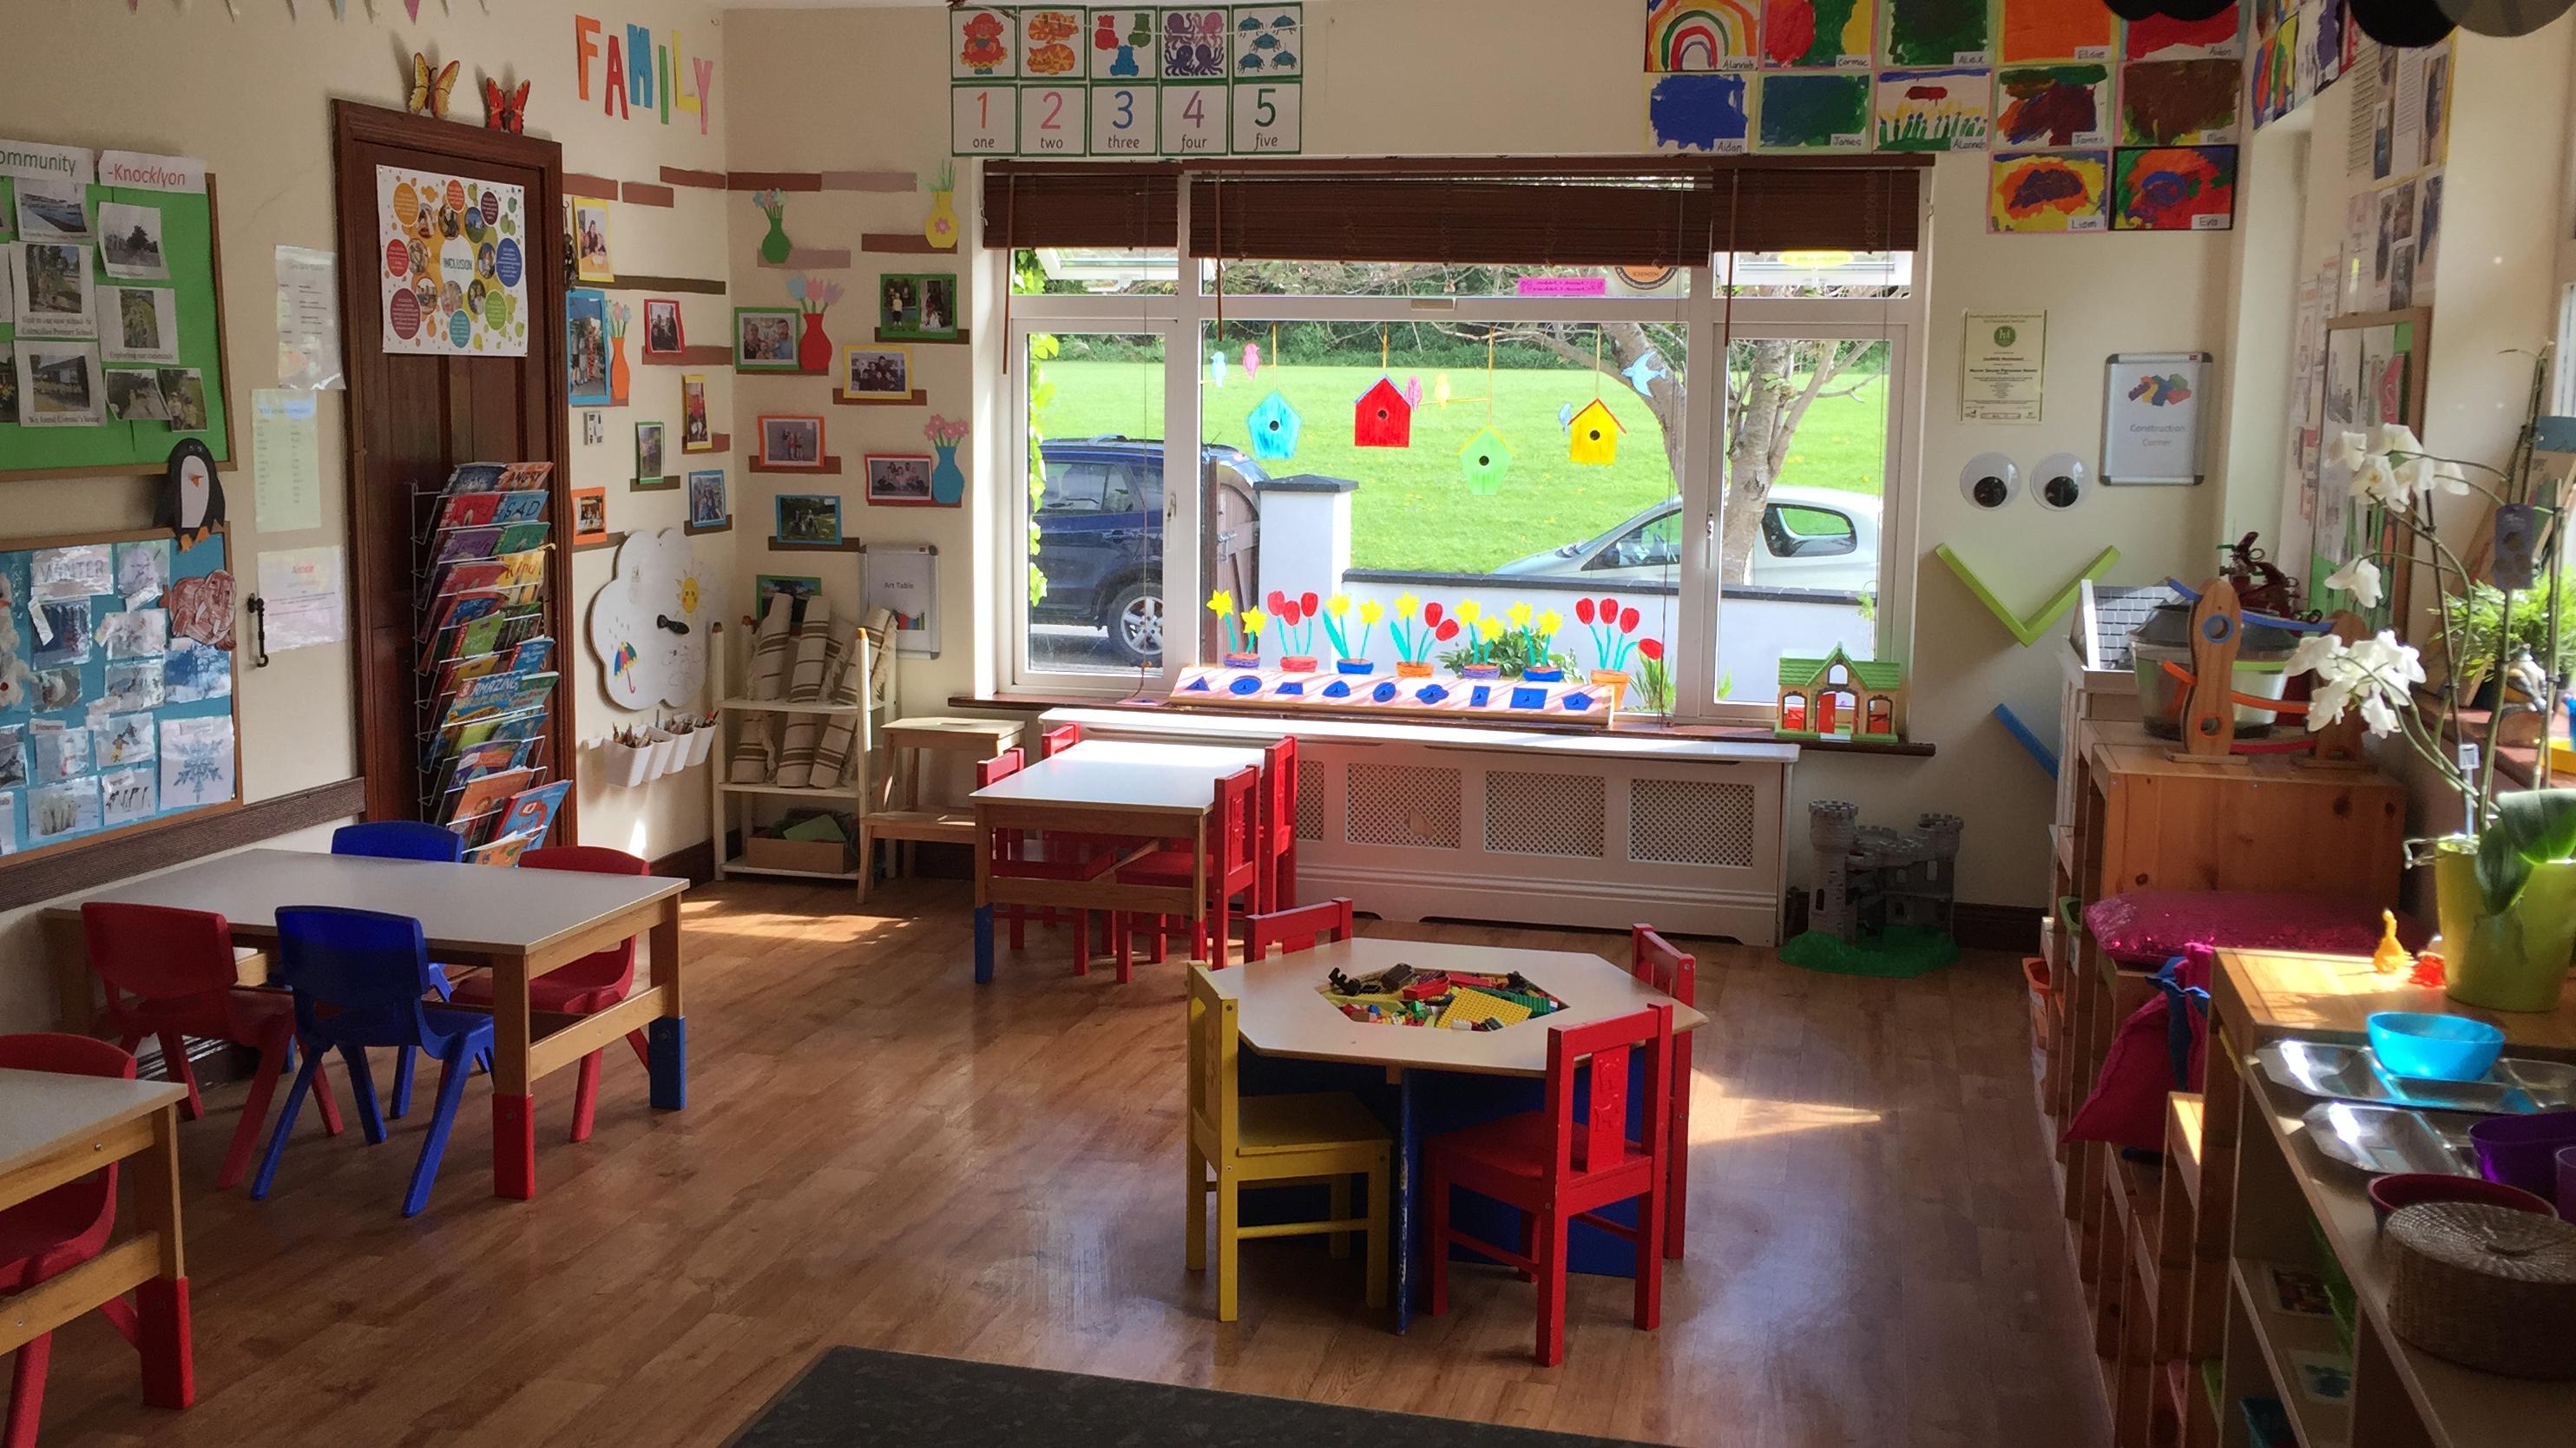 Coolkidz Montessori In Knocklyon County Dublin